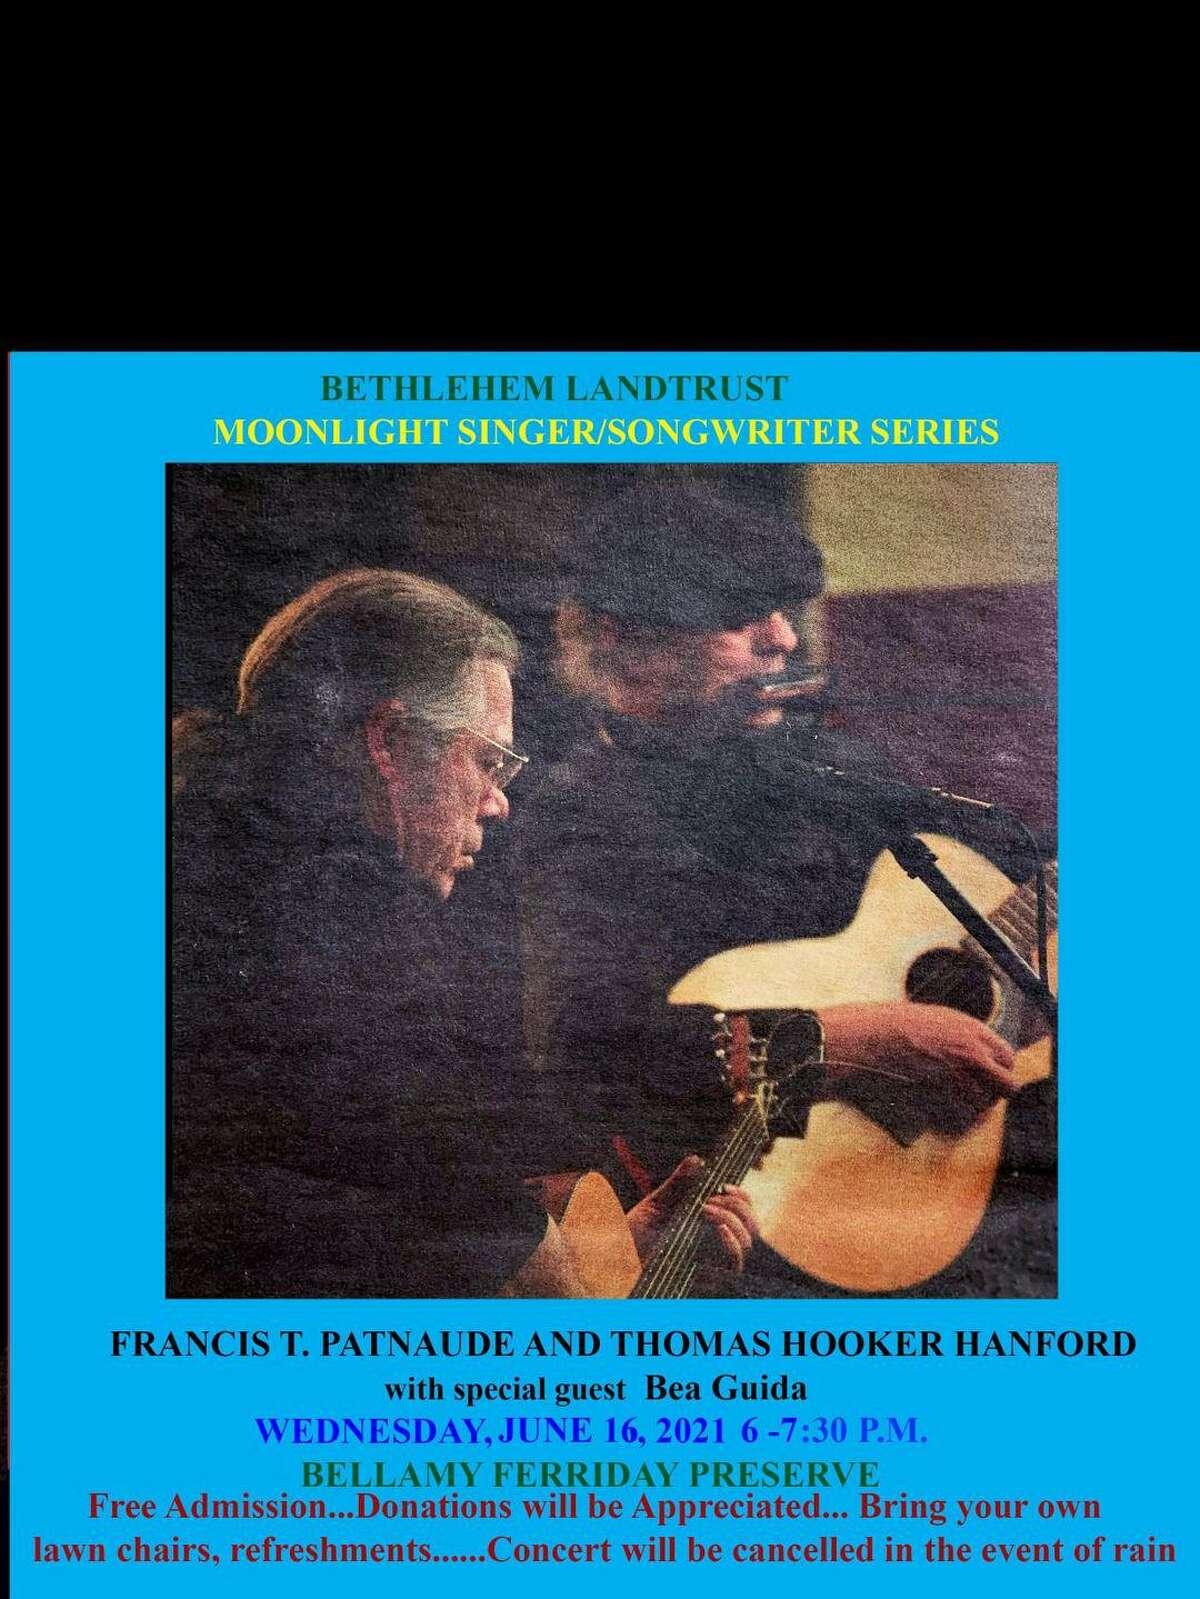 singer/songwriters Fran Patnaude and Tom Hanford perform Aug. 7 in Bethelehem.